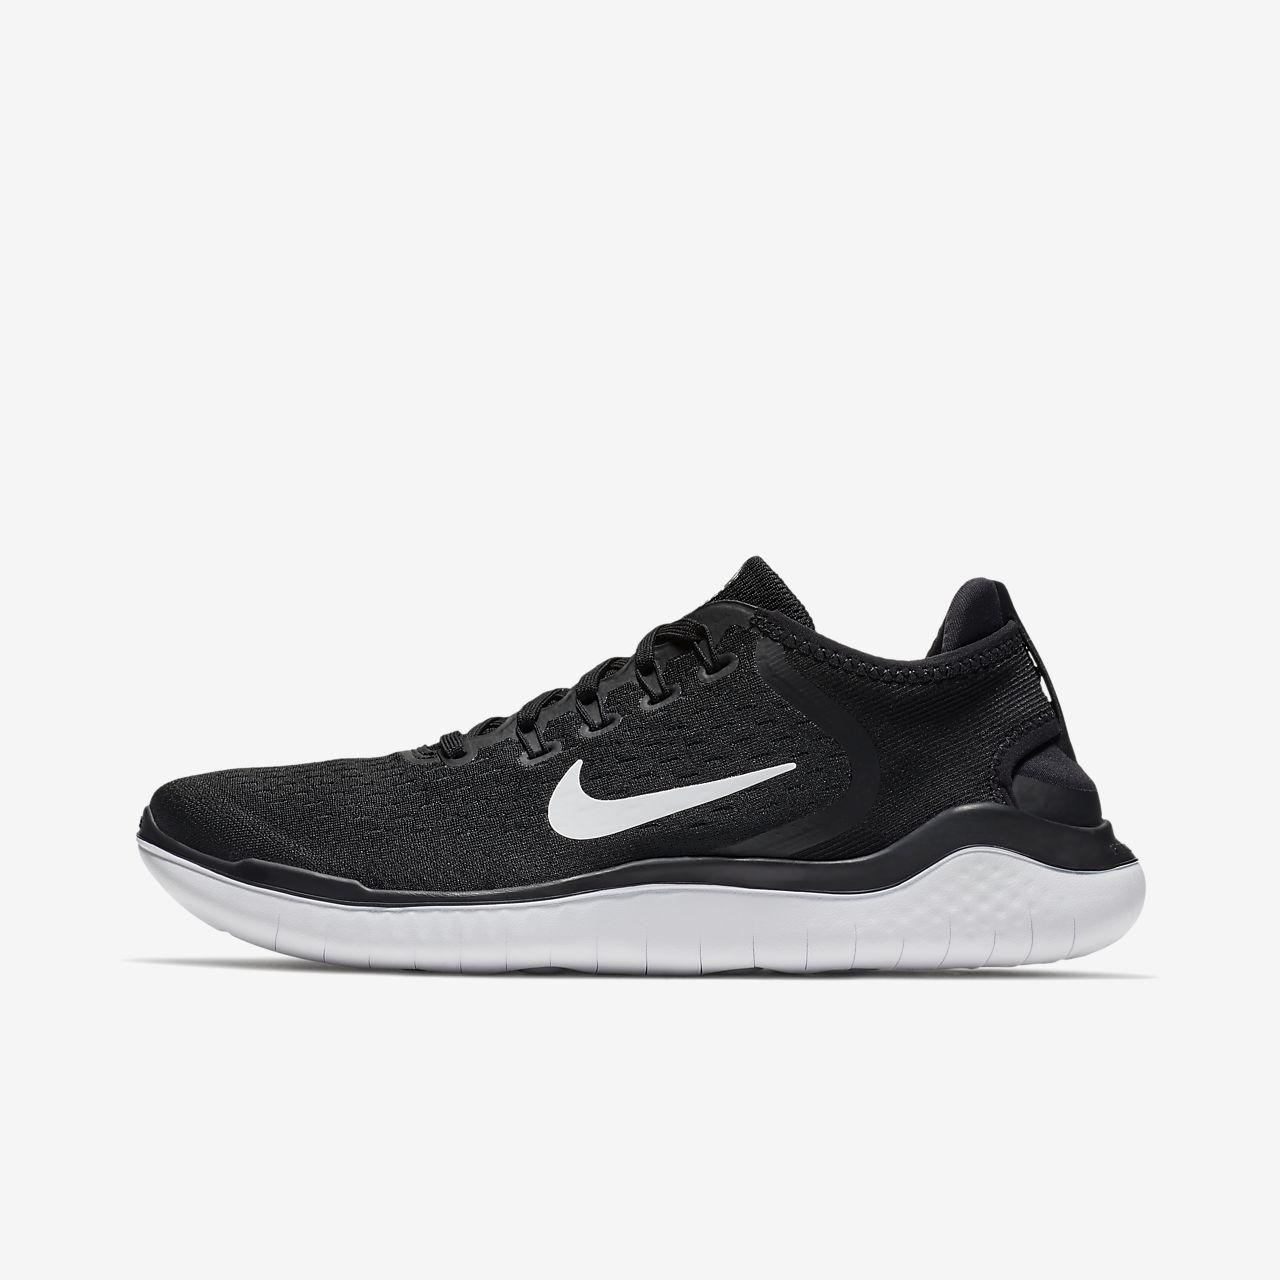 Nike Free RN 2018 Herren Laufenschuh 942836 100